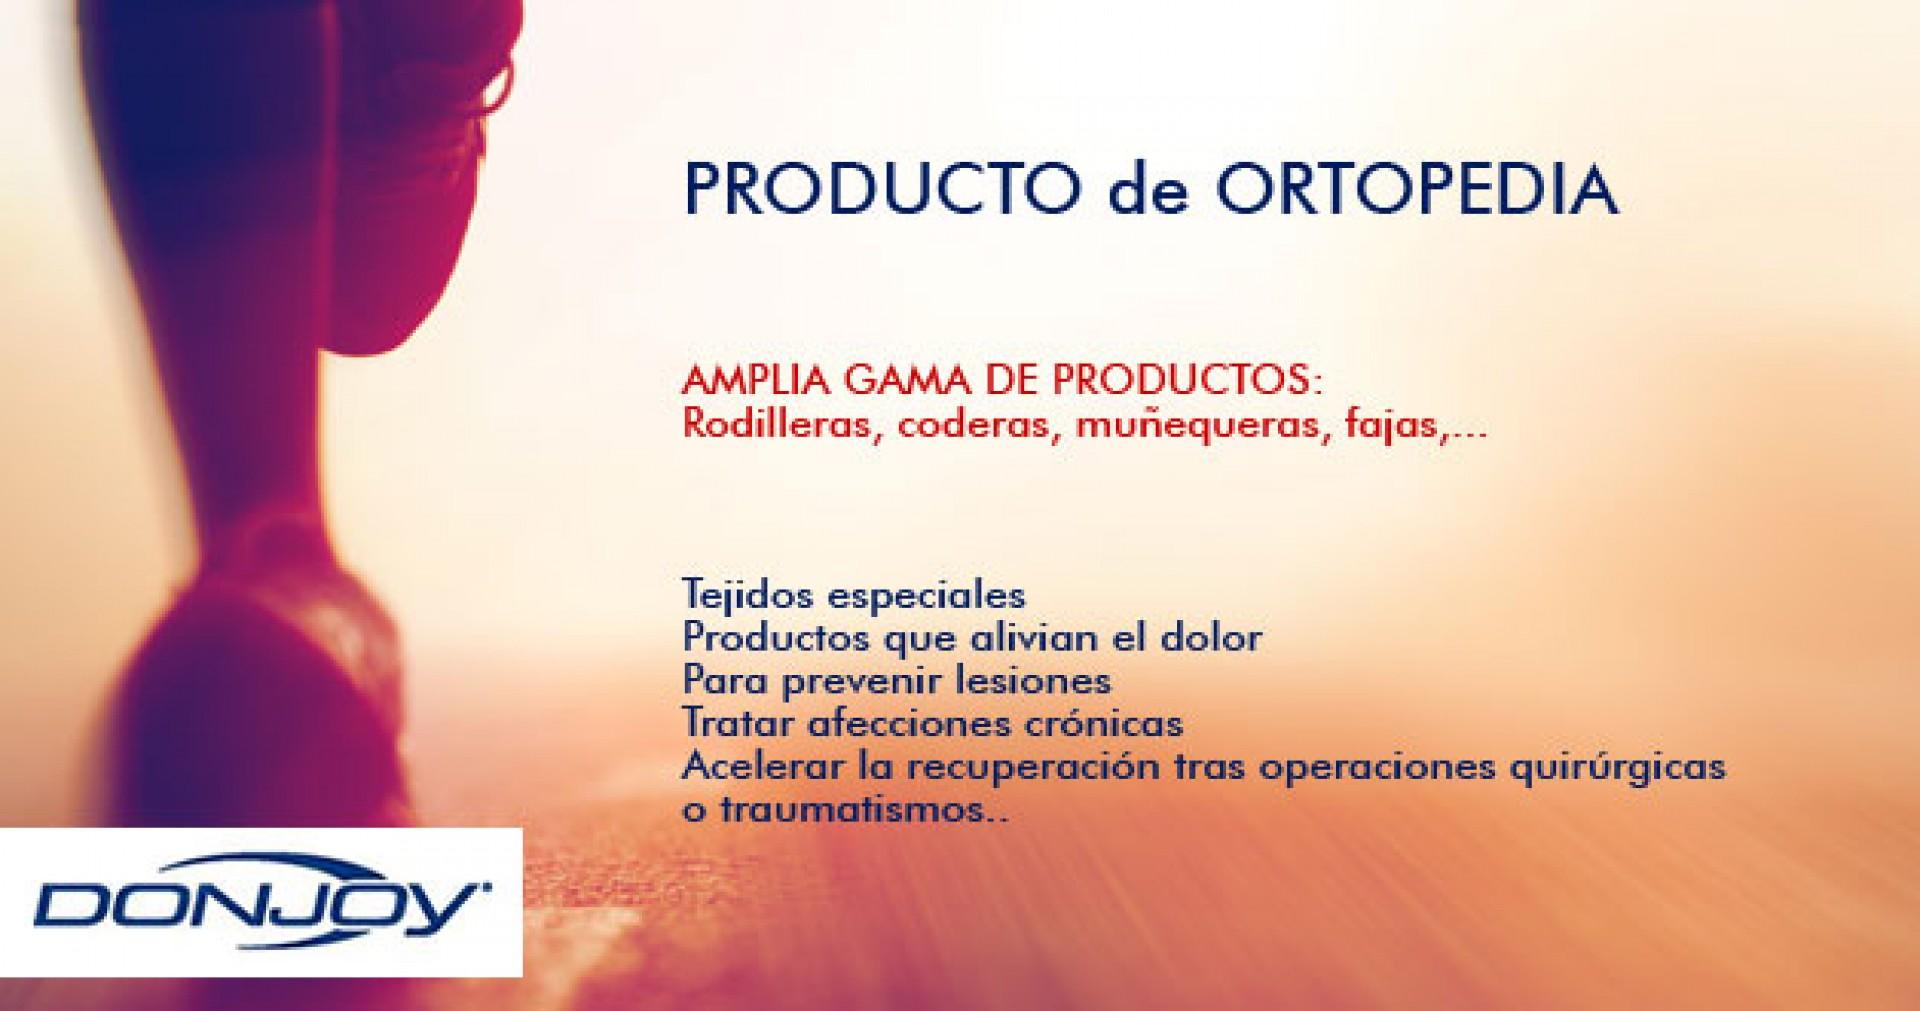 Ortopedia Donjoy